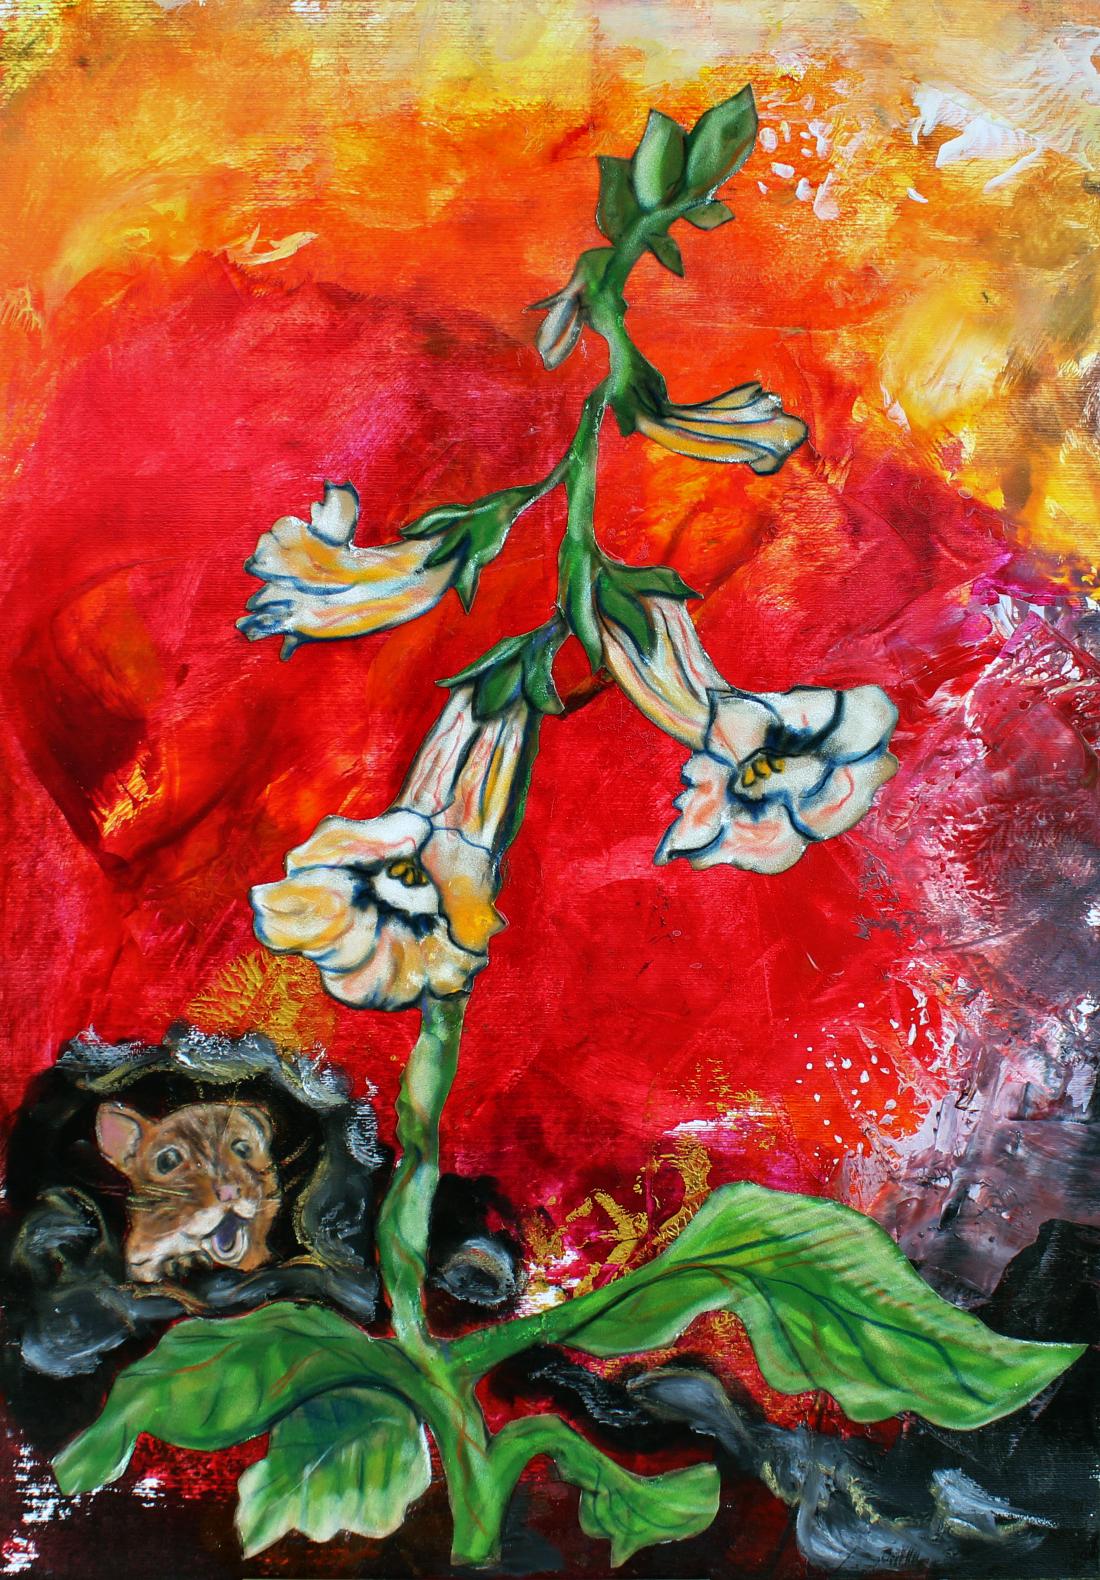 Wer guckt denn da; Mixed Art: Enkaustik & Kreide auf Acrylkarton & Velours, 70 x 50 cm